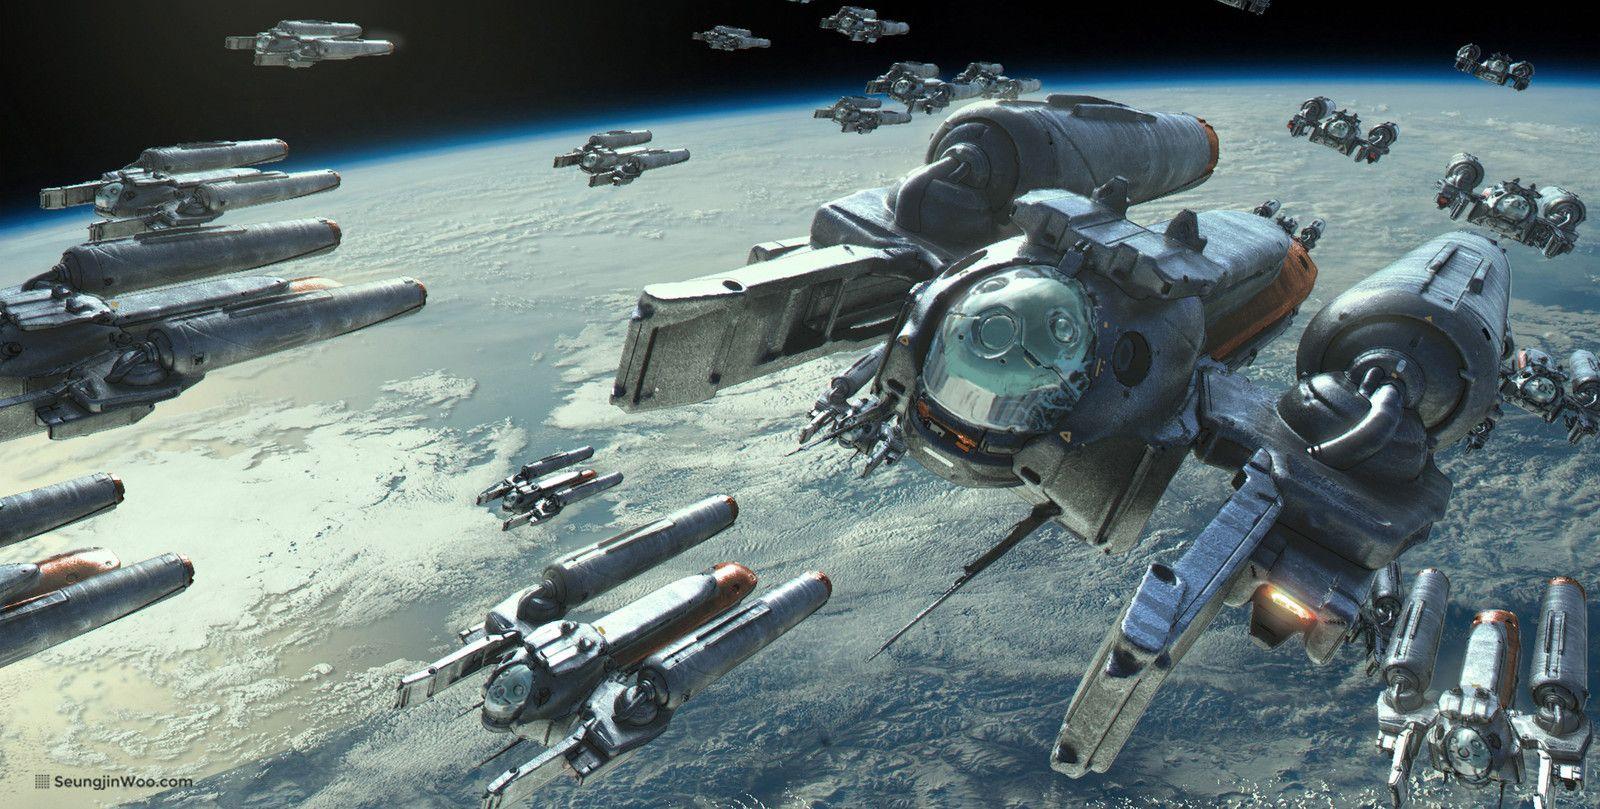 Daily Sketch Week 1 Aircraft Spaceship Seungjin Woo Concept Ships Sci Fi Ships Starship Concept